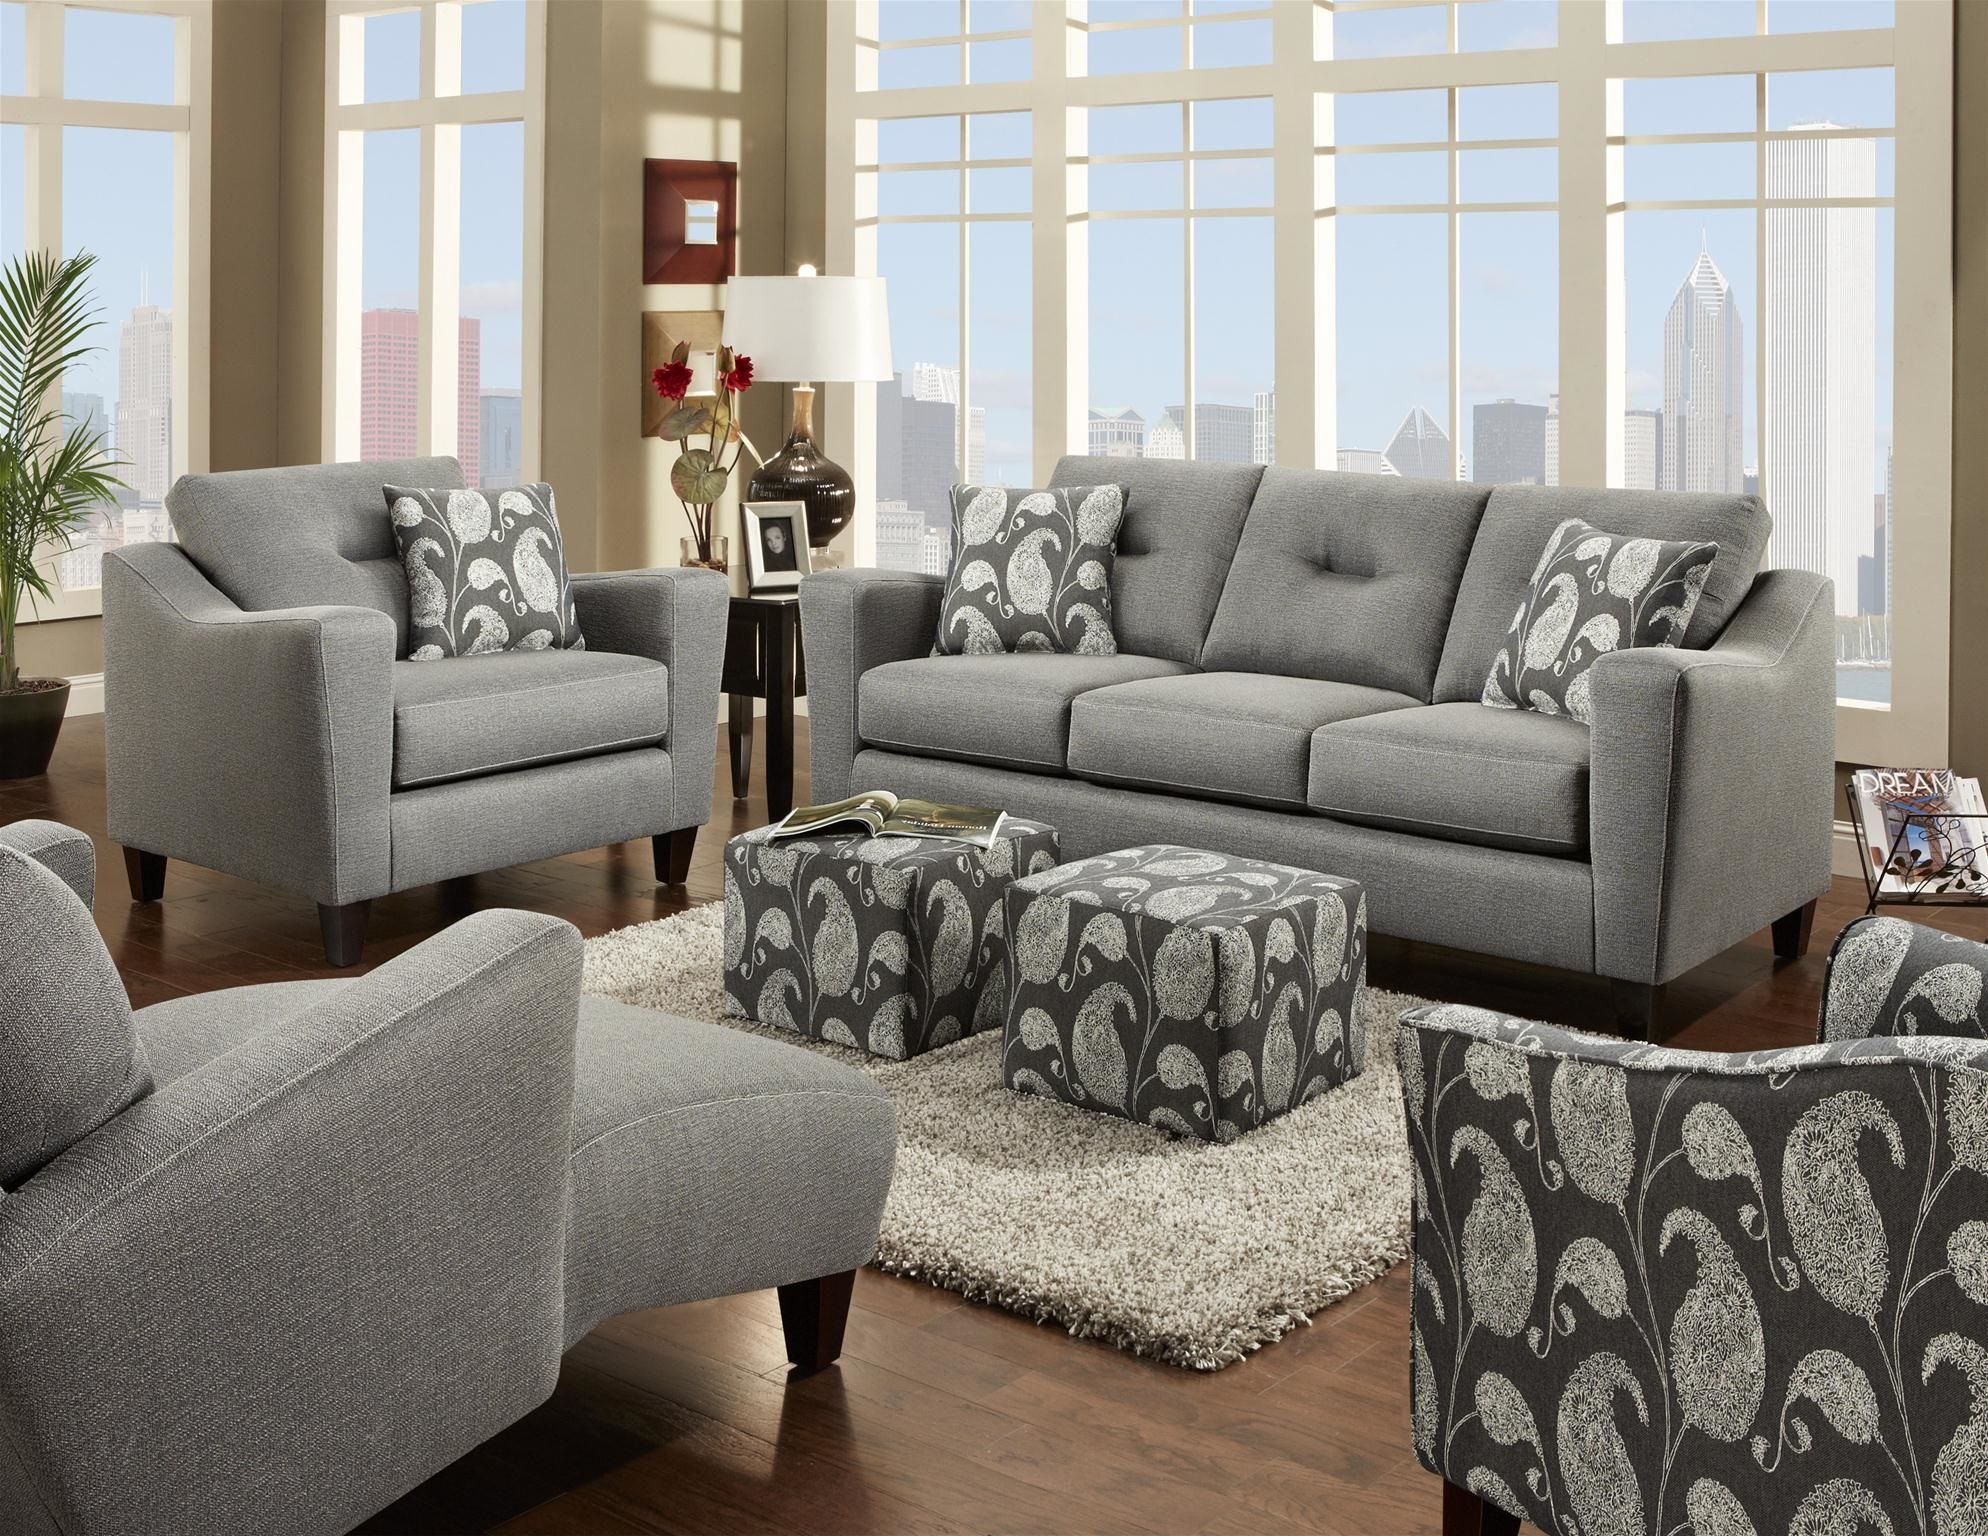 Bodie Living Room Set 8100apexcinder Living Room Sets From